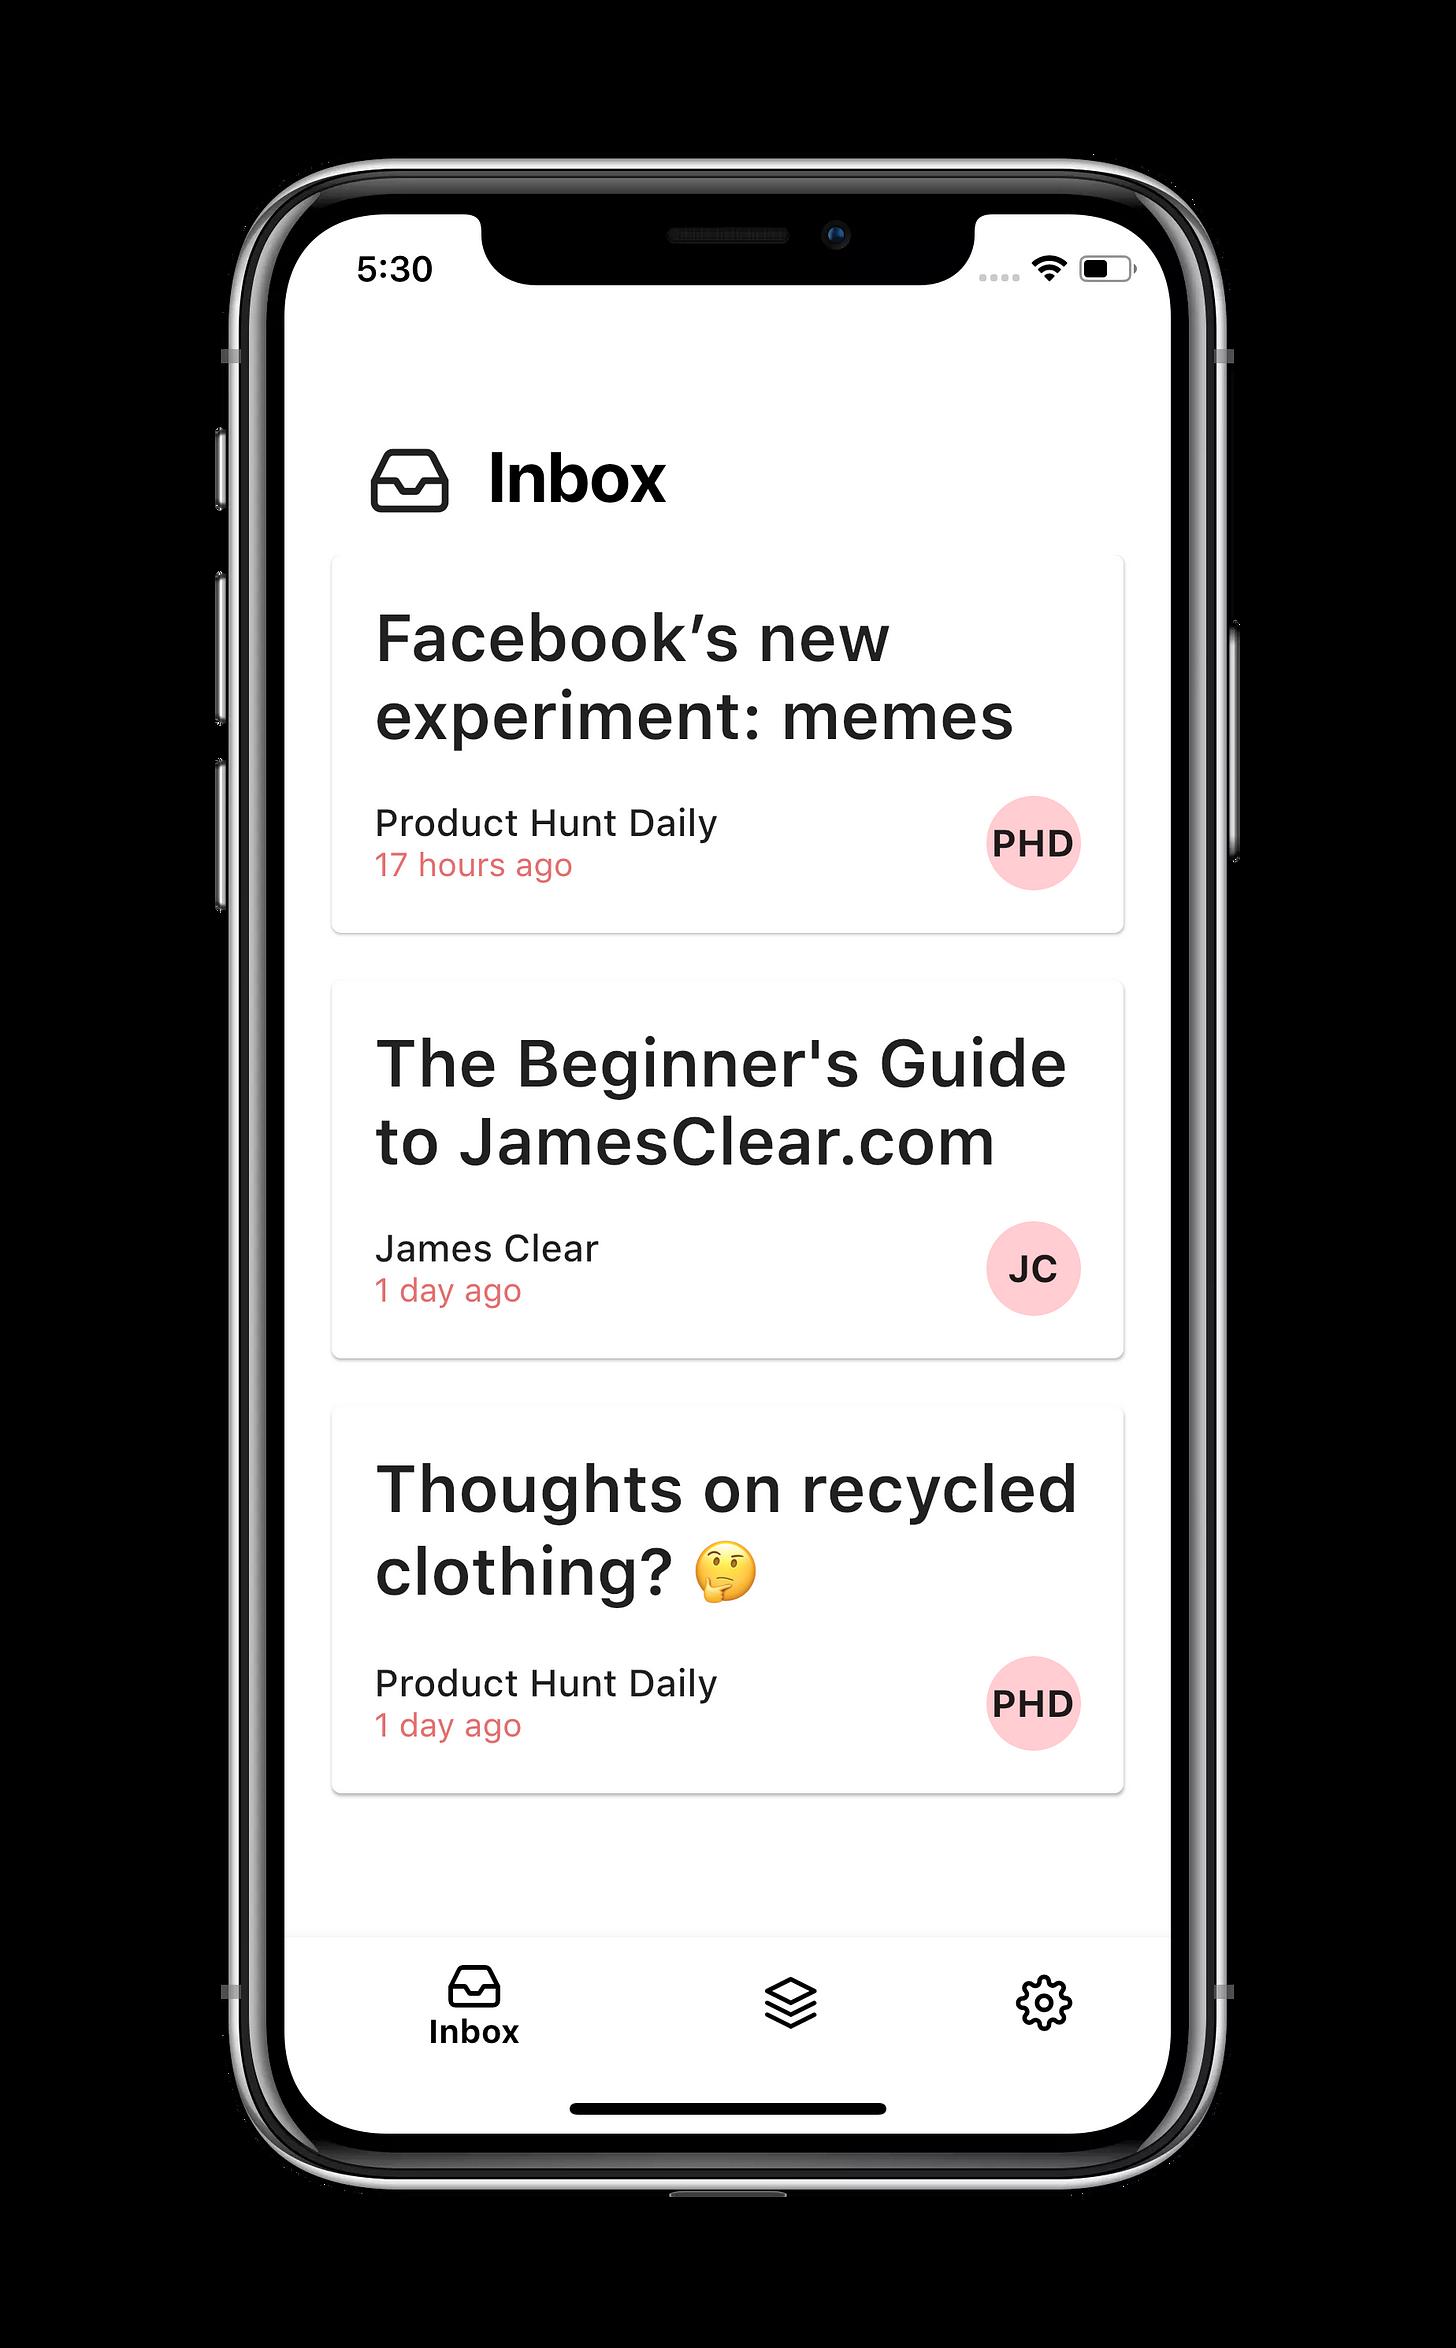 rick huckstep wiser newsletter apple tiktok crypto https://rickhuckstep.com